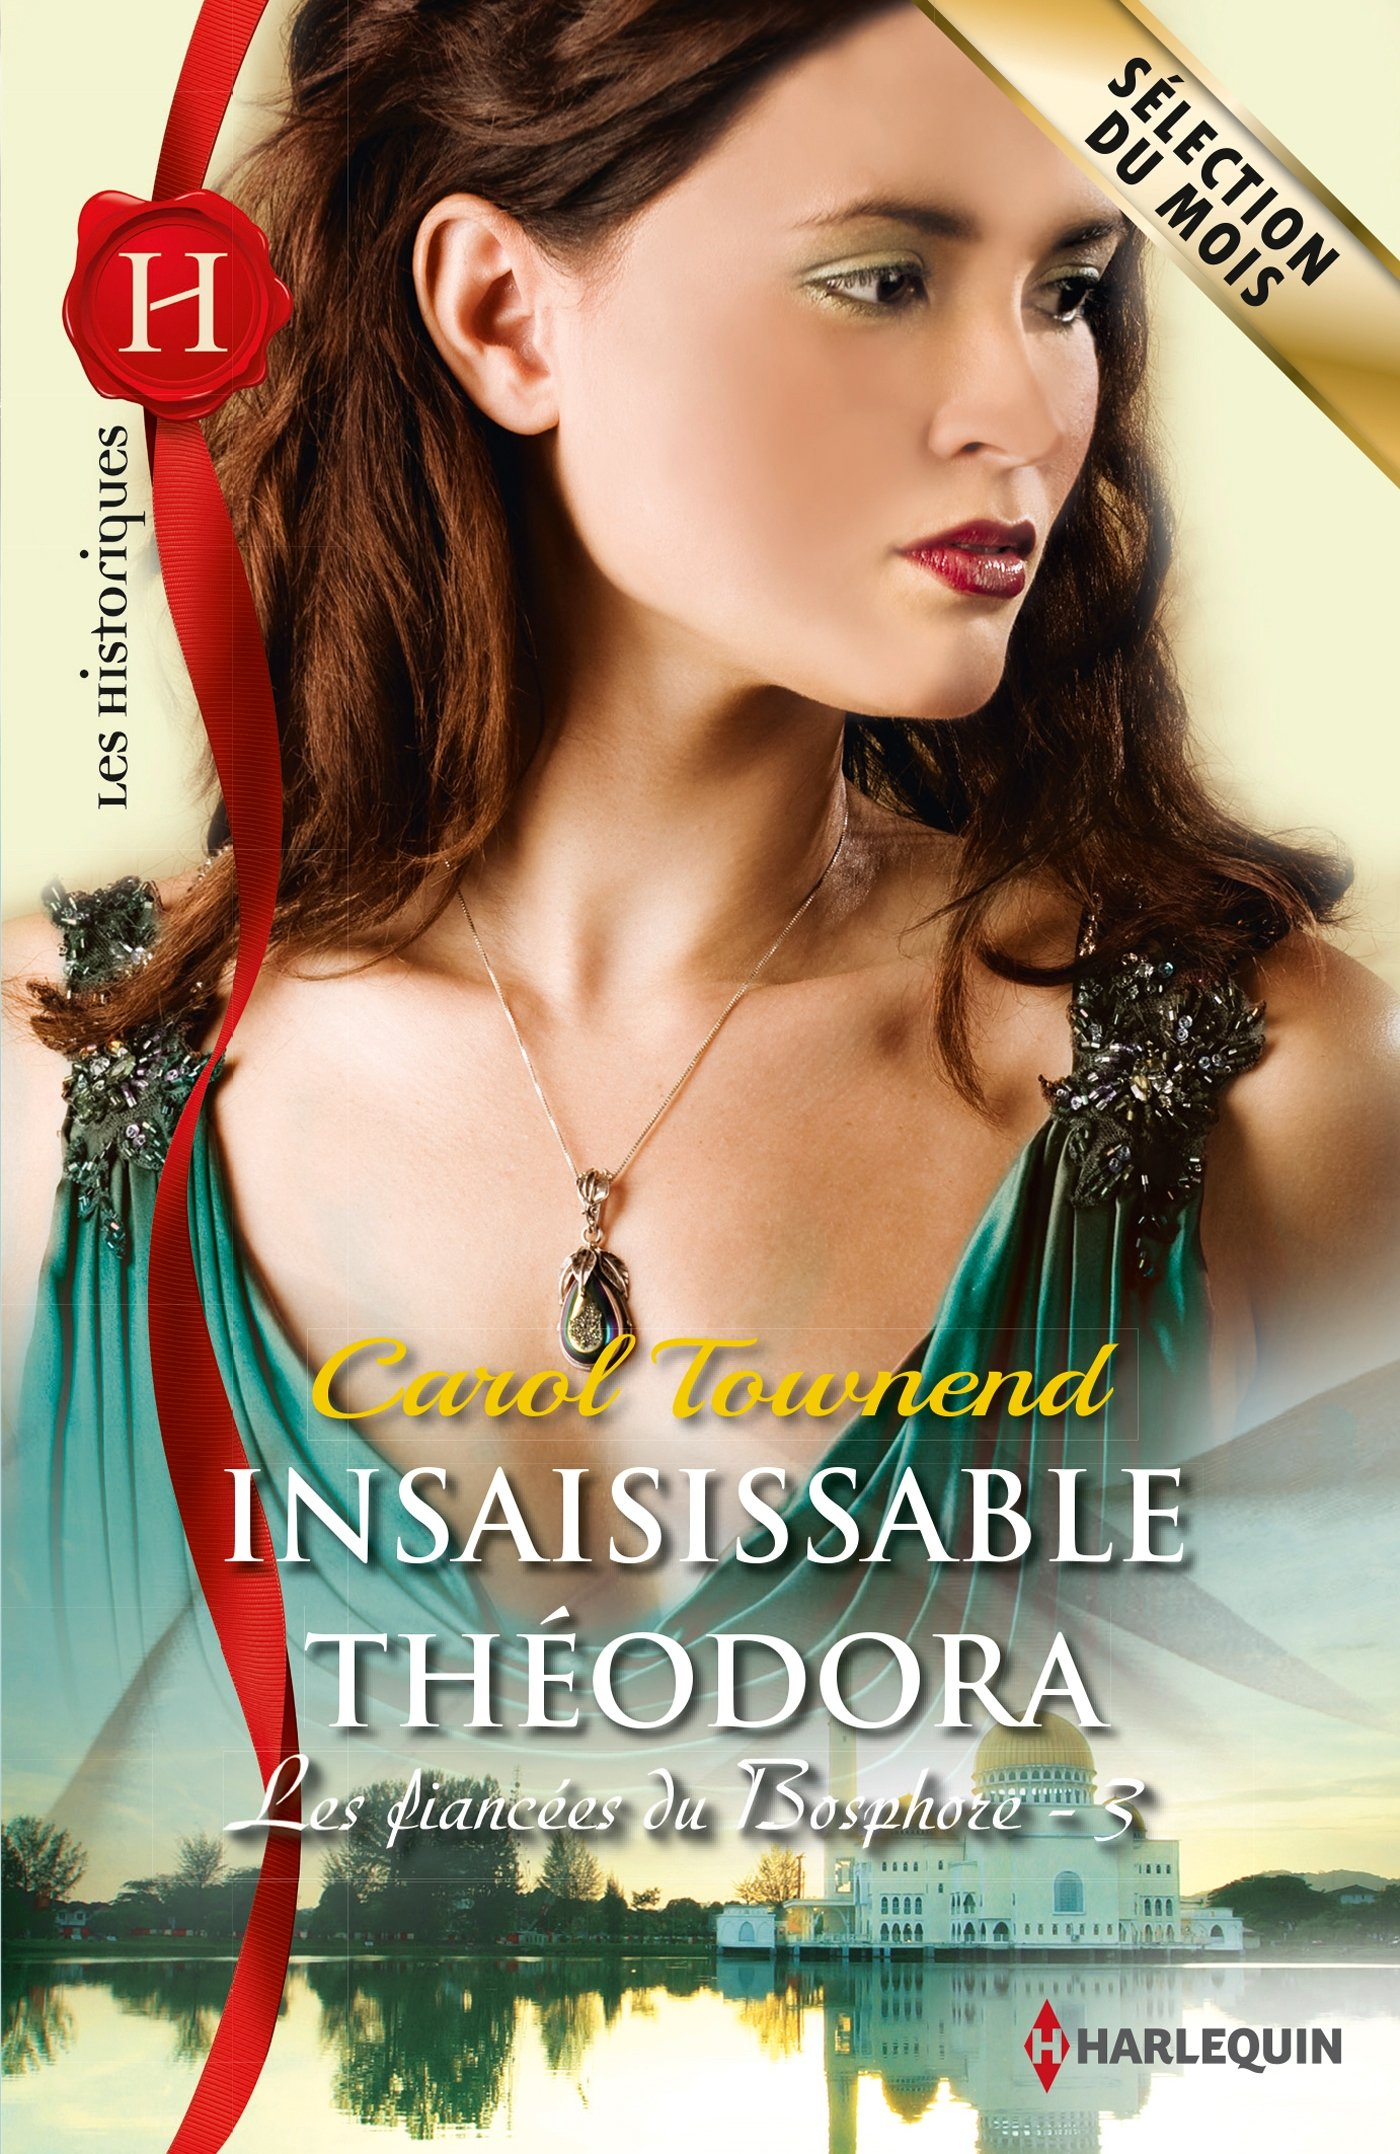 Les fiancées du Bosphore – Tome 3 :Insaisissable Théodorade Carol Townend 81zuuk5HzhL